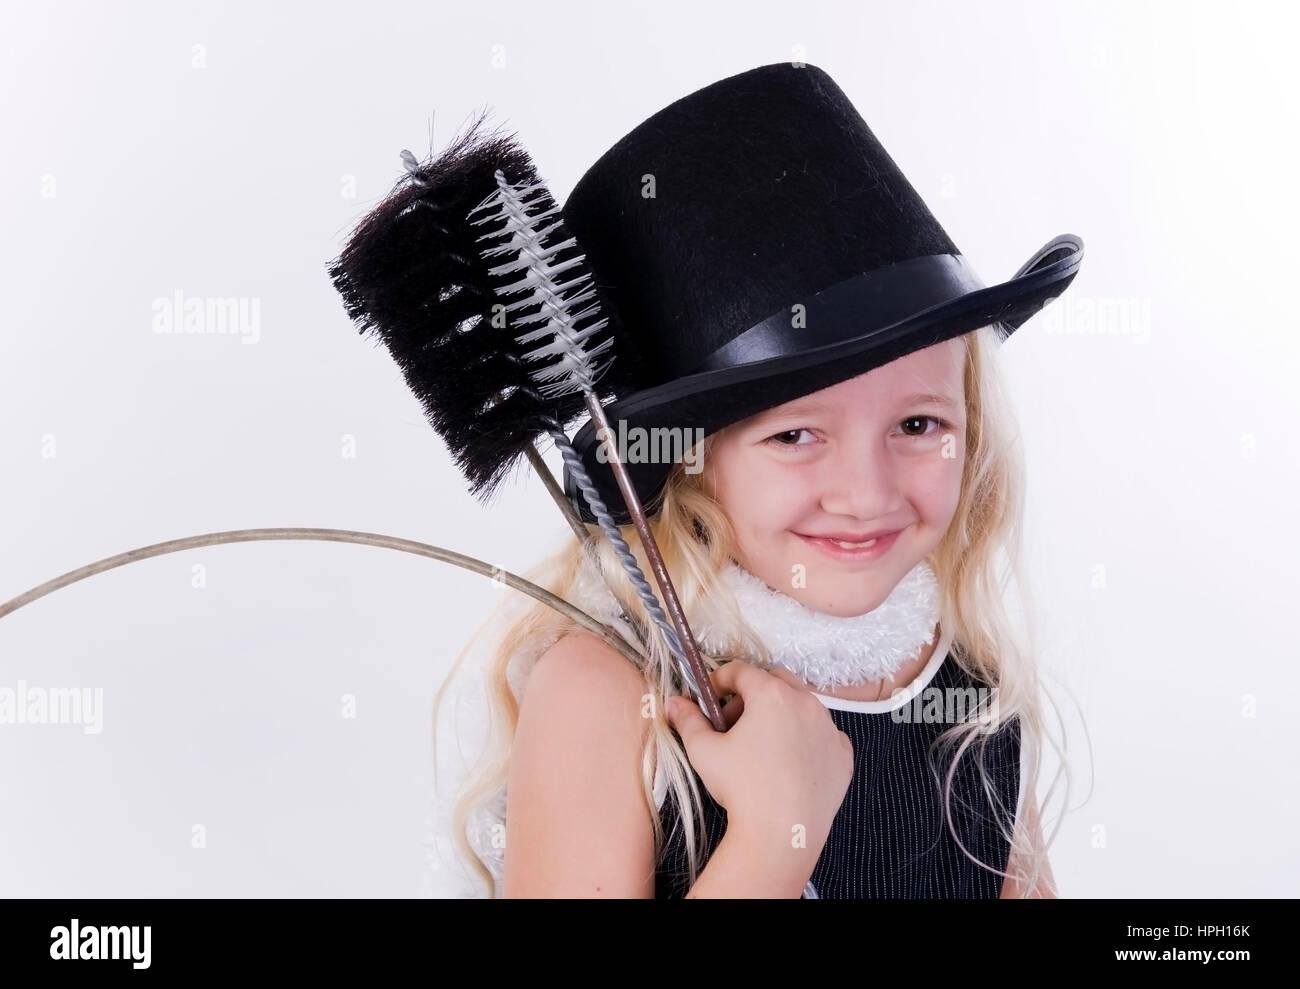 Chimney Sweep Child Stock Photos Amp Chimney Sweep Child